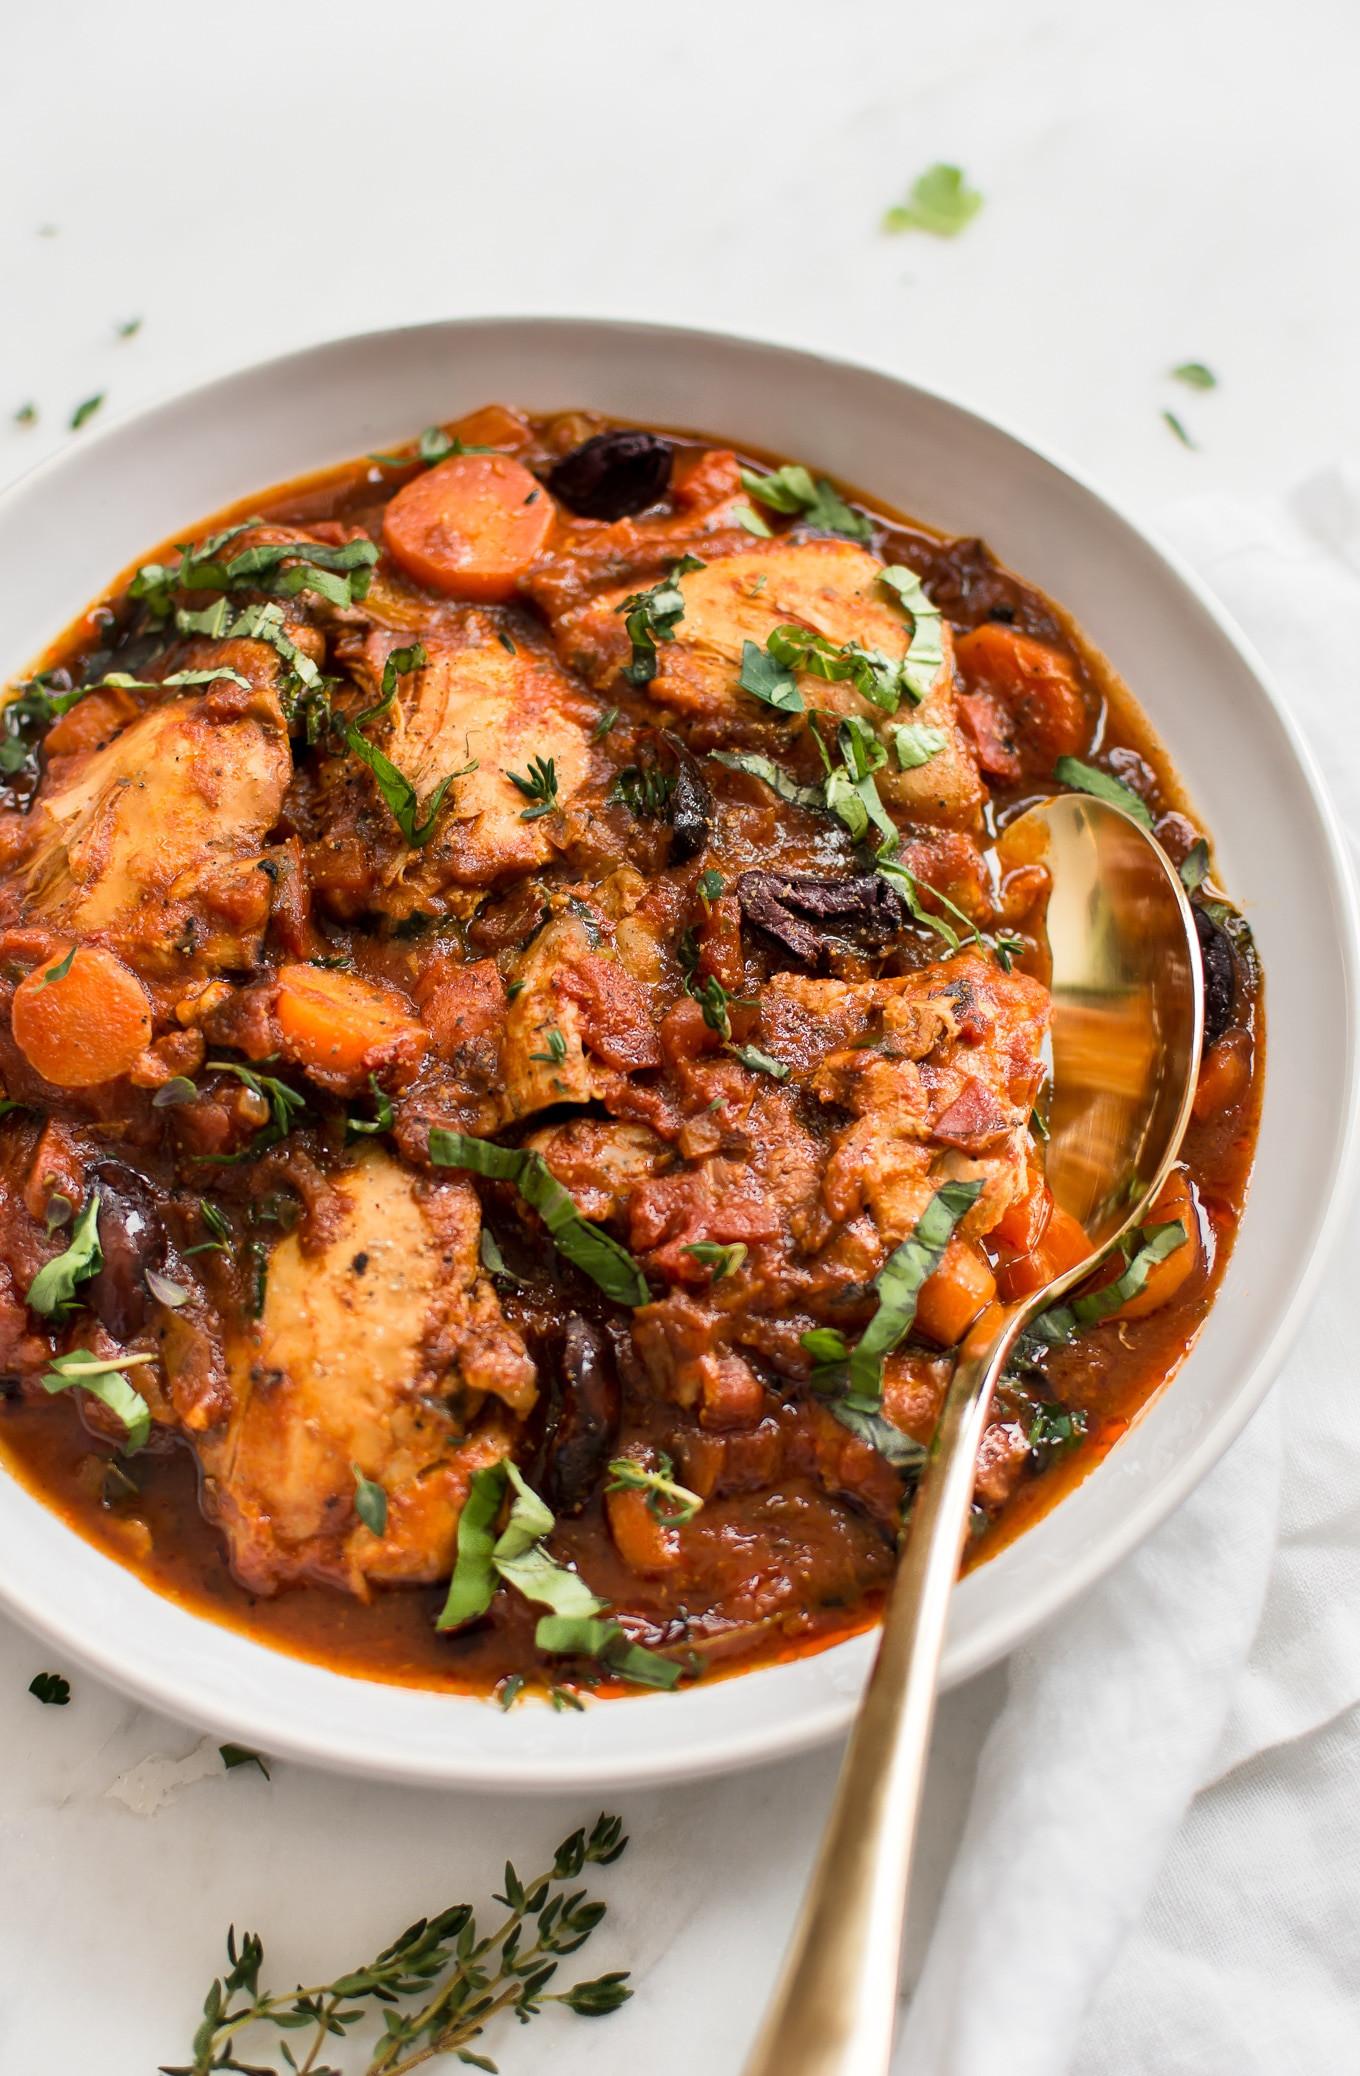 Healthy Instant Pot Recipes Chicken  Easy Instant Pot Chicken Cacciatore • Salt & Lavender